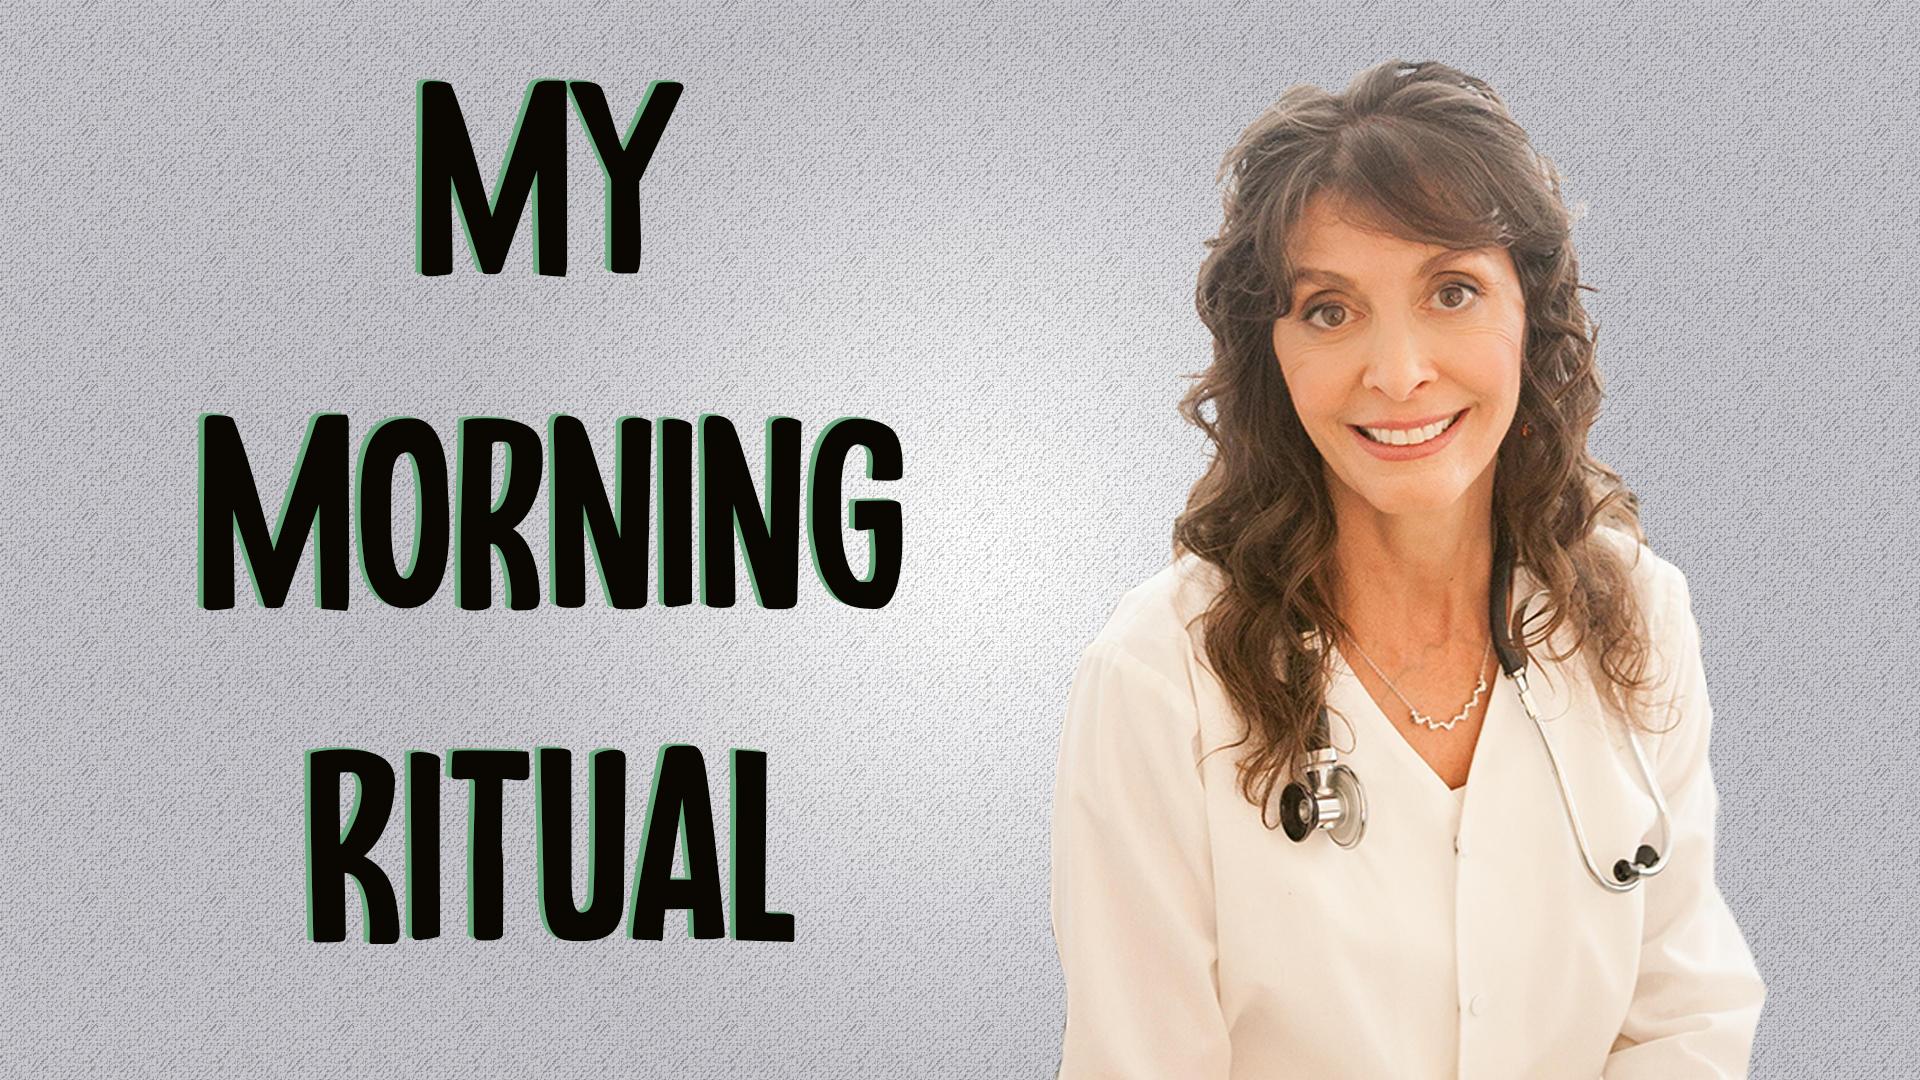 Naturopathic morning routine